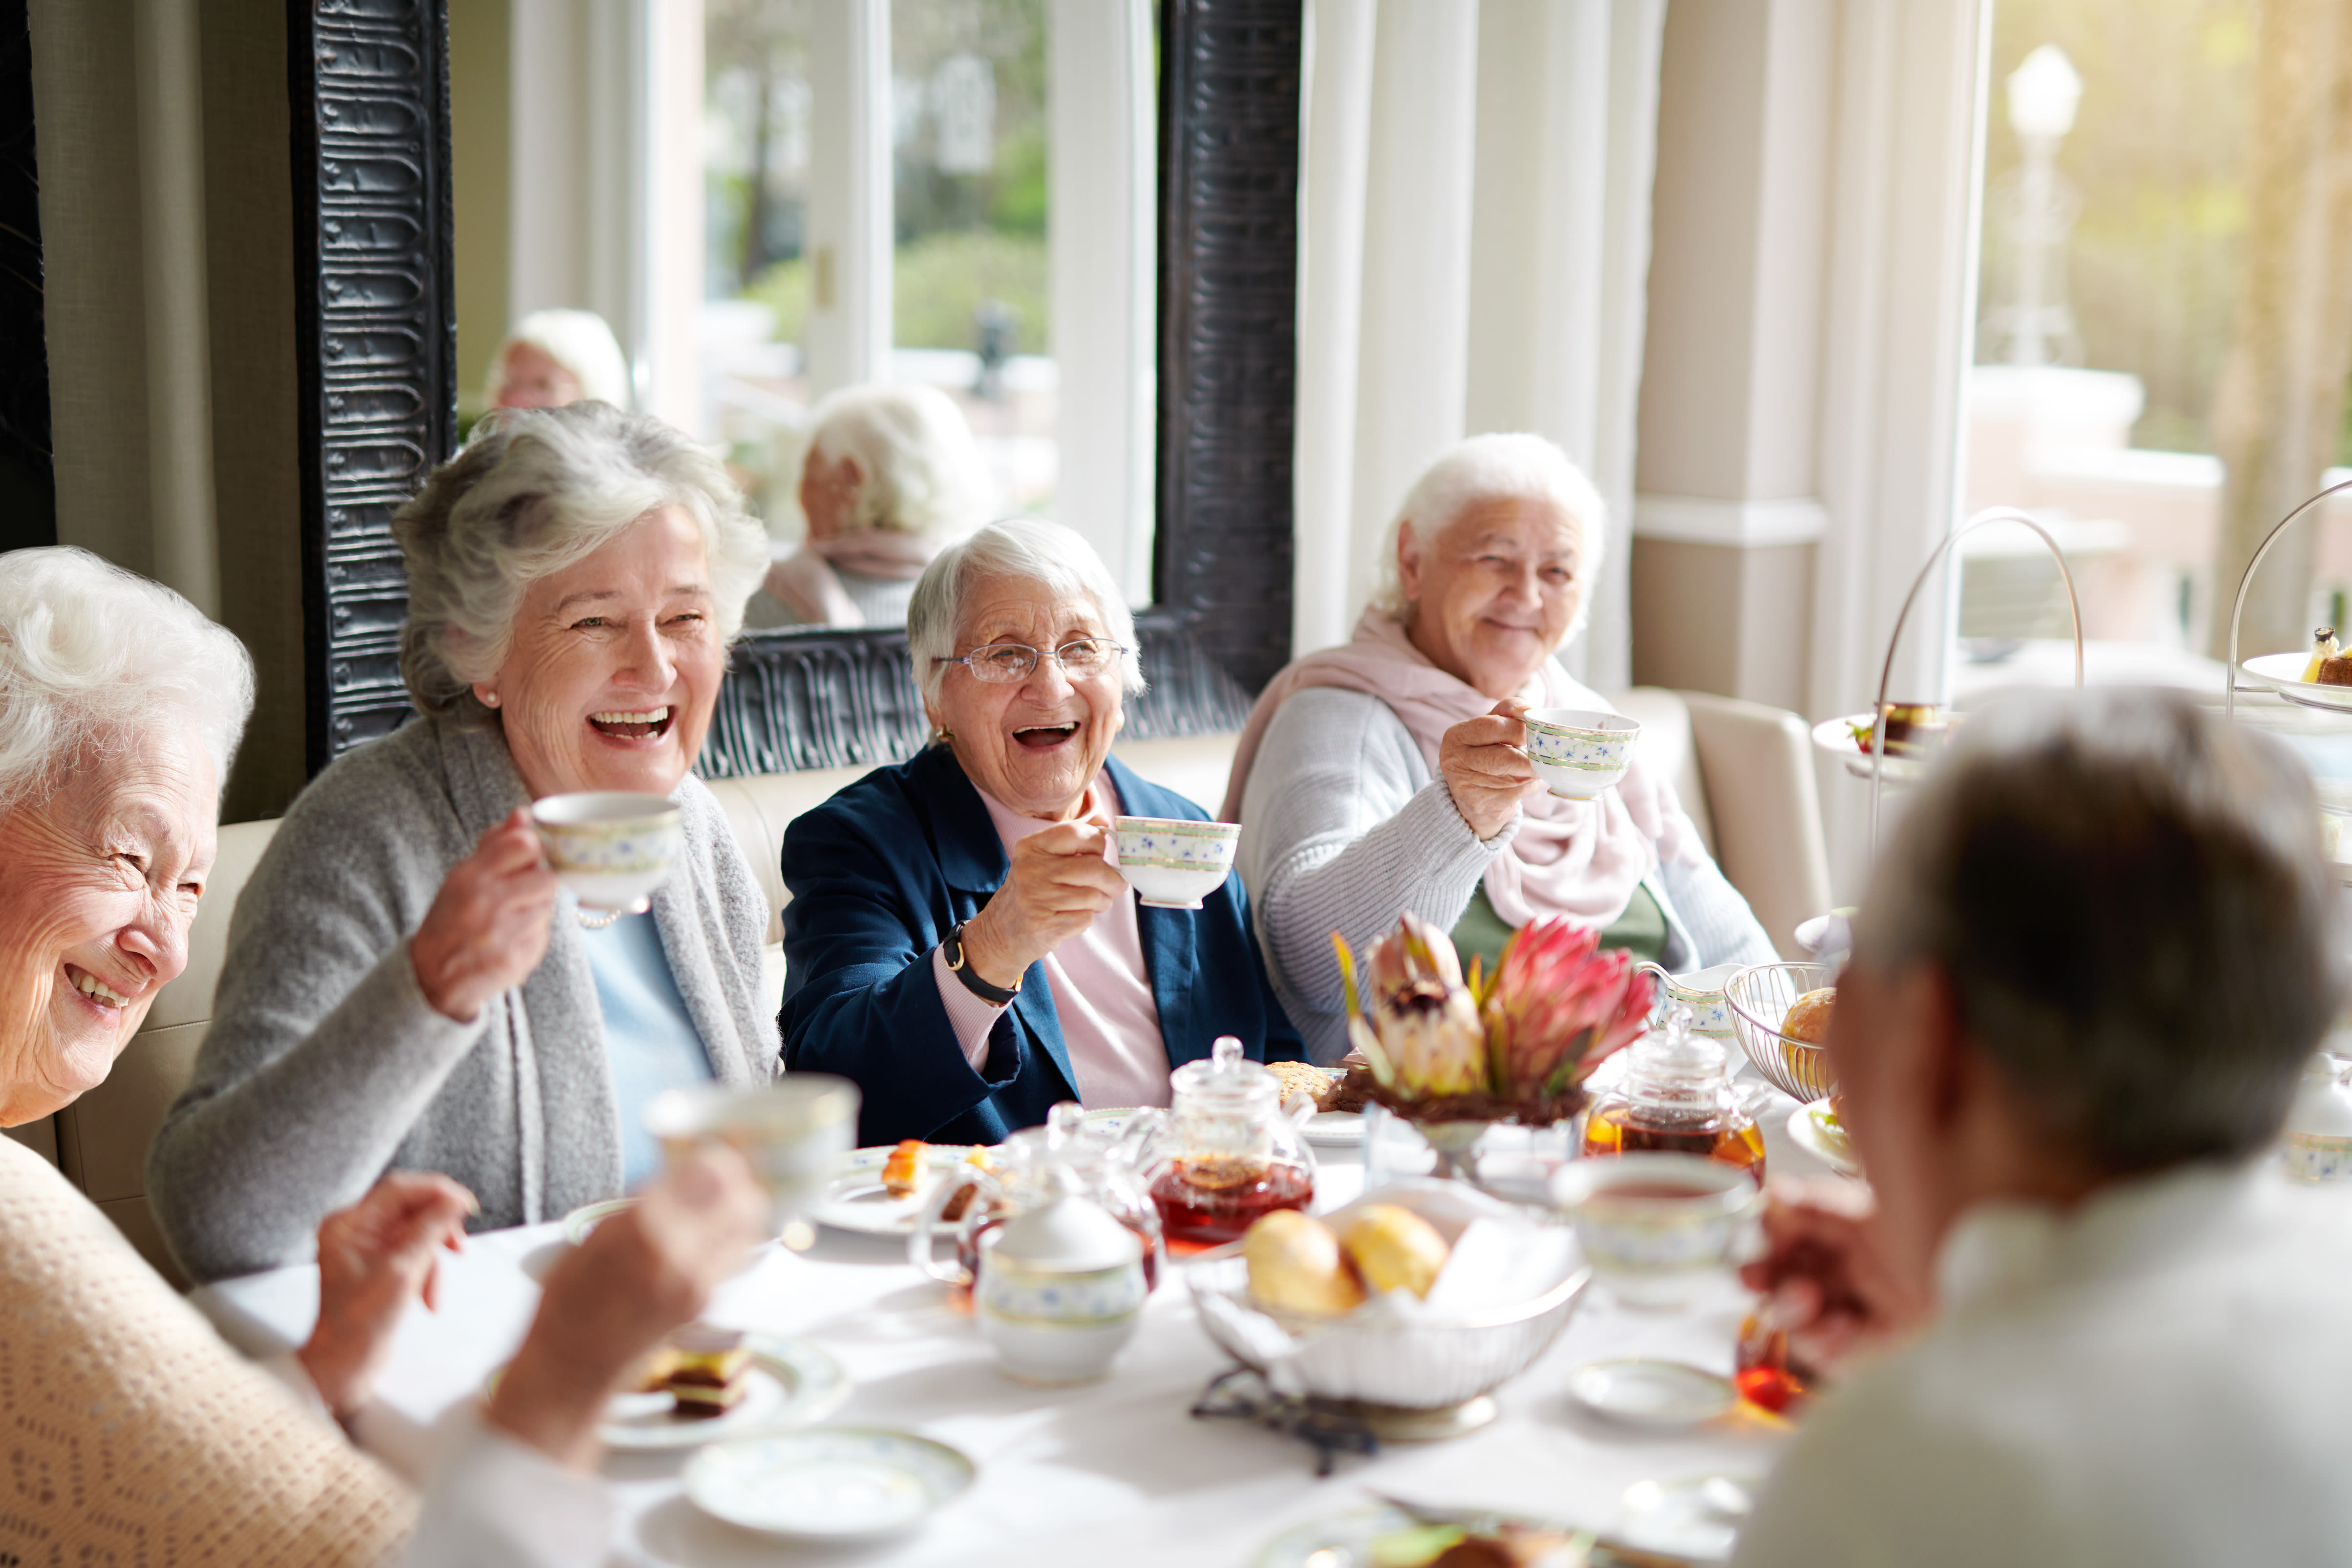 Residents having tea together at Harmony at Harts Run in Glenshaw, Pennsylvania